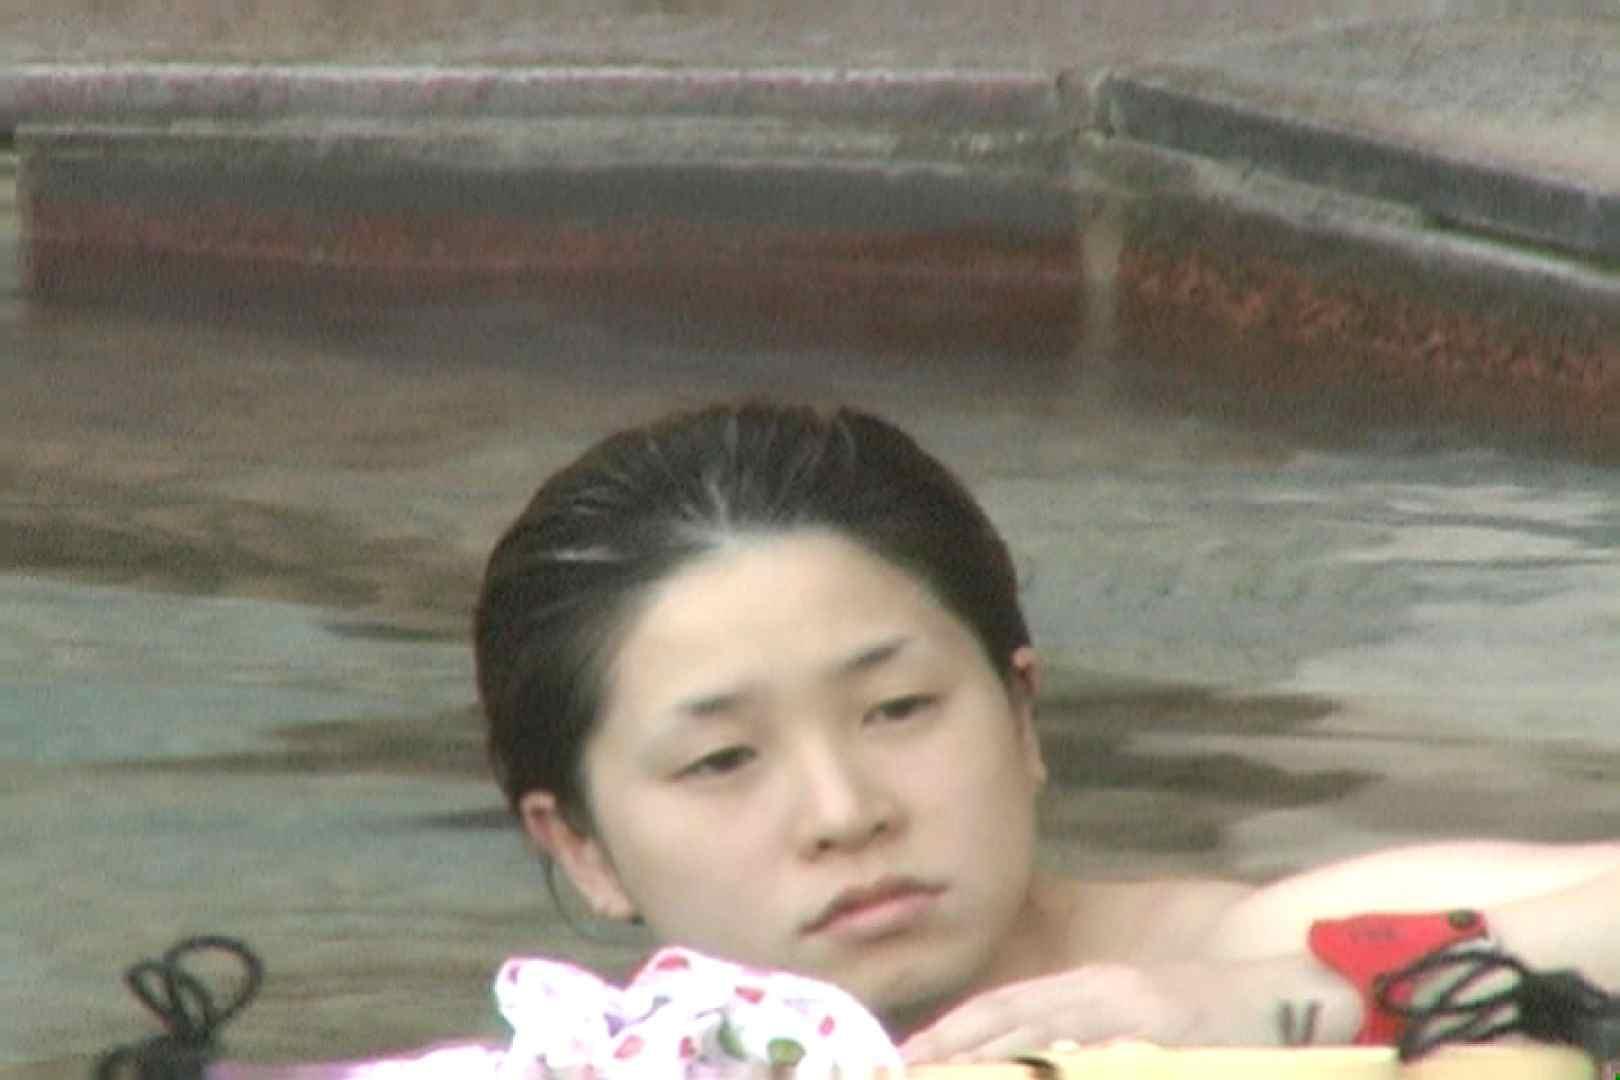 Aquaな露天風呂Vol.628 HなOL | 露天  66pic 25